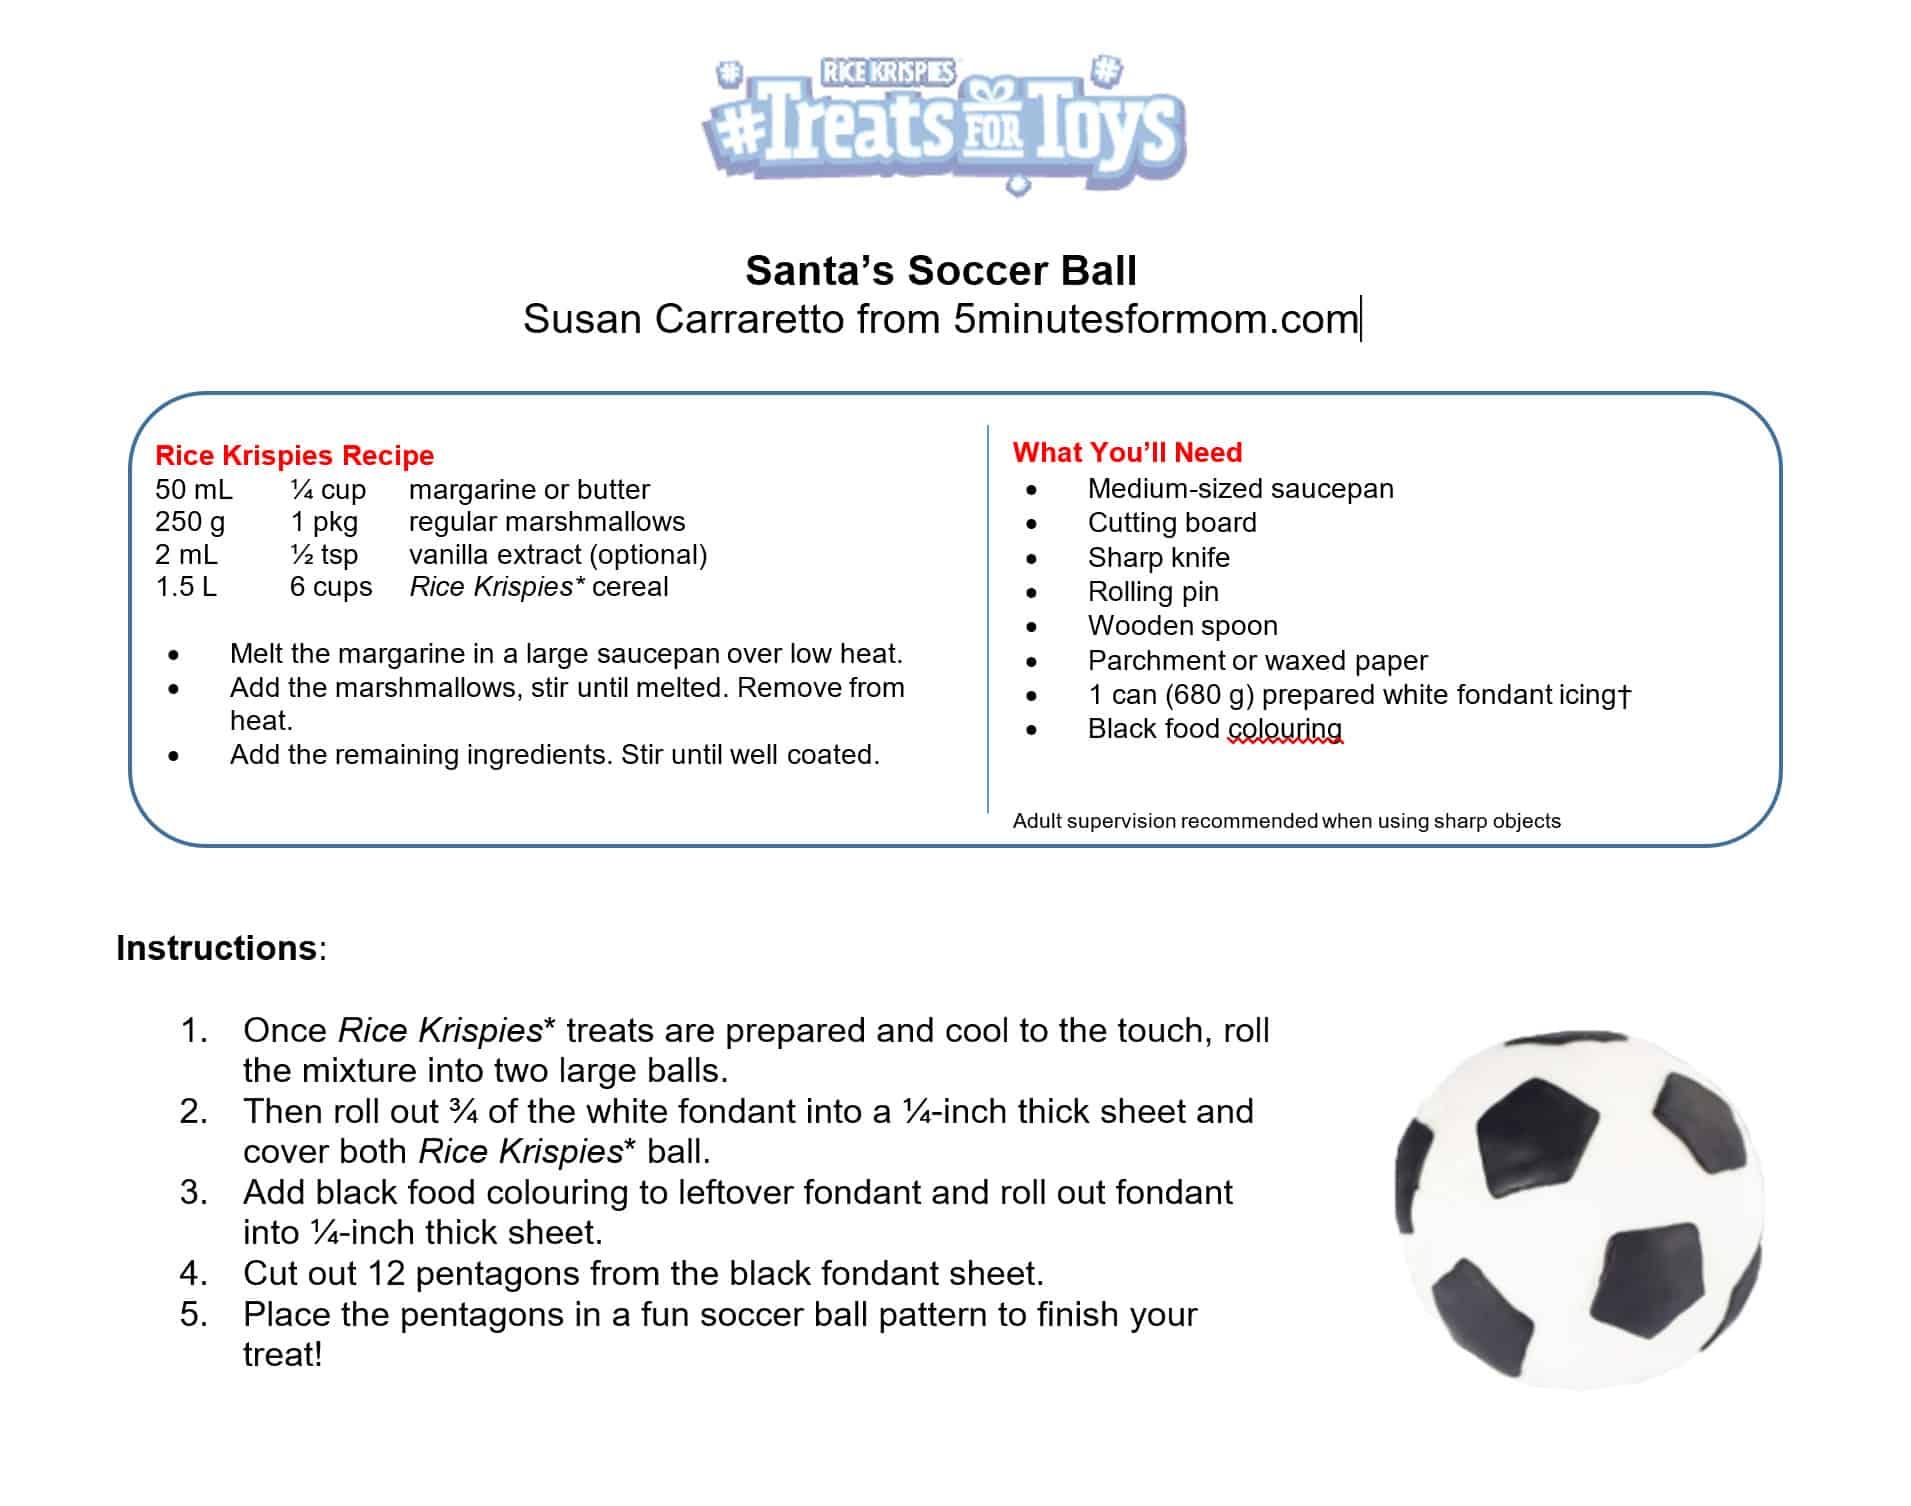 santas-soccer-ball-rice-krispies-treats-recipes-5m4m